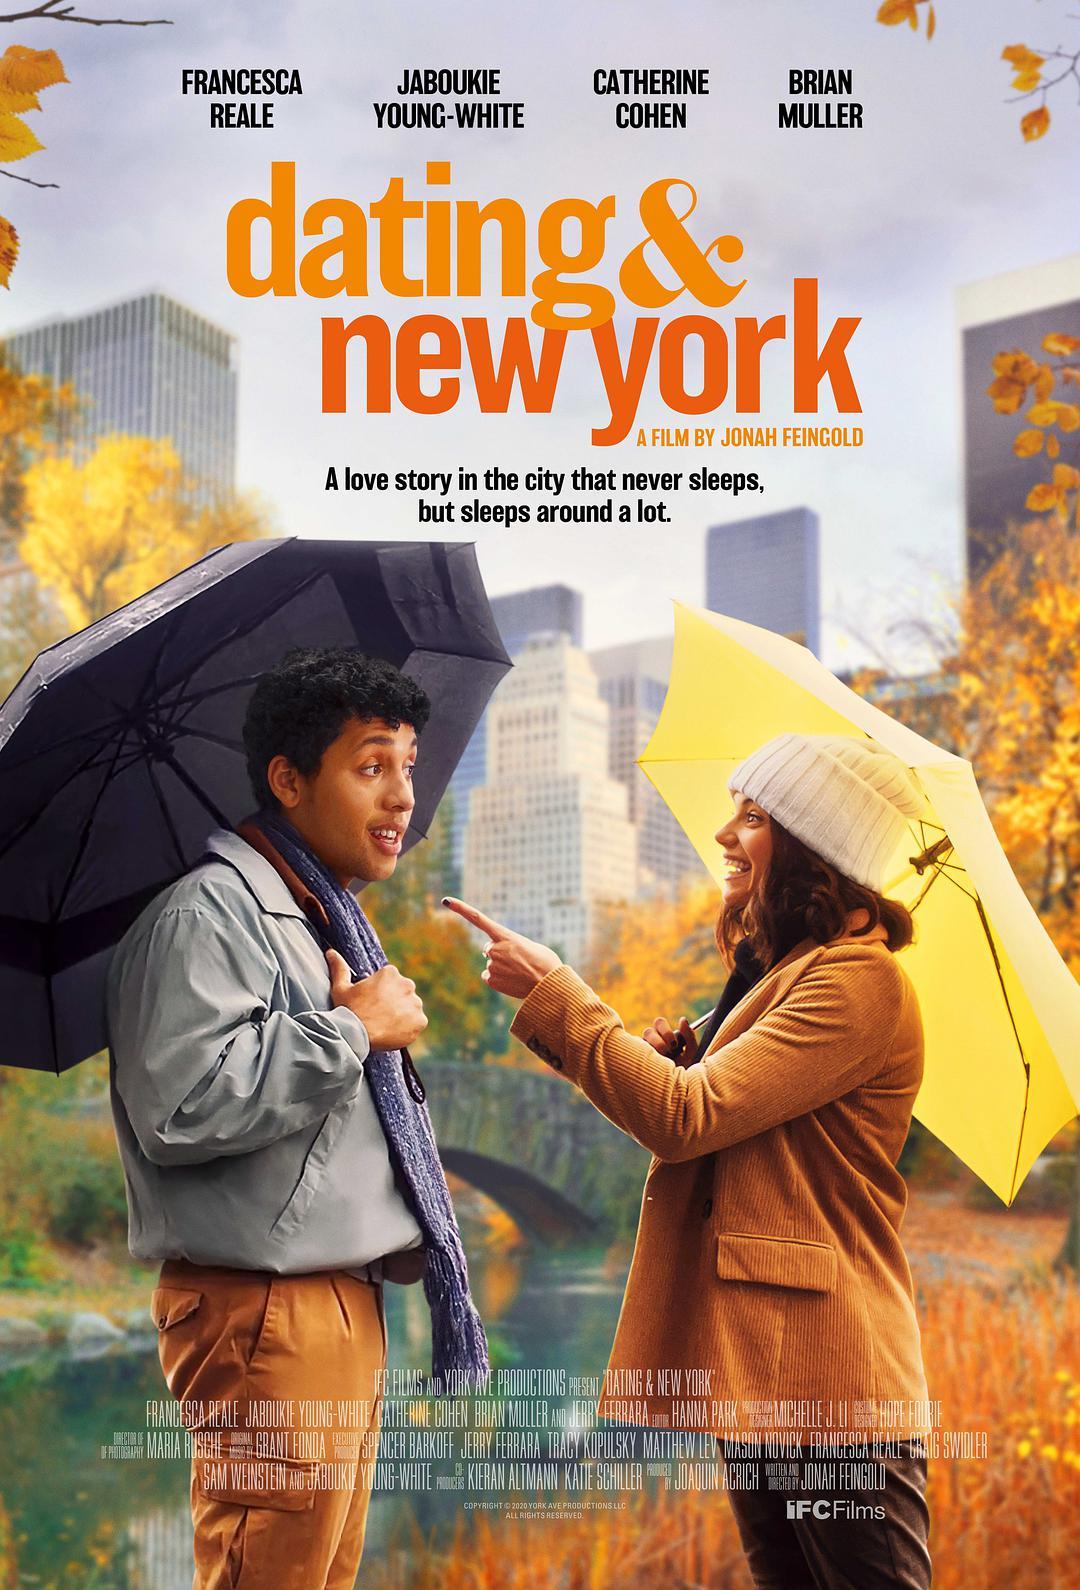 悠悠MP4_MP4电影下载_约会在纽约 Dating.and.New.York.2021.1080p.WEBRip.DD5.1.x264-NOGRP 4.56GB